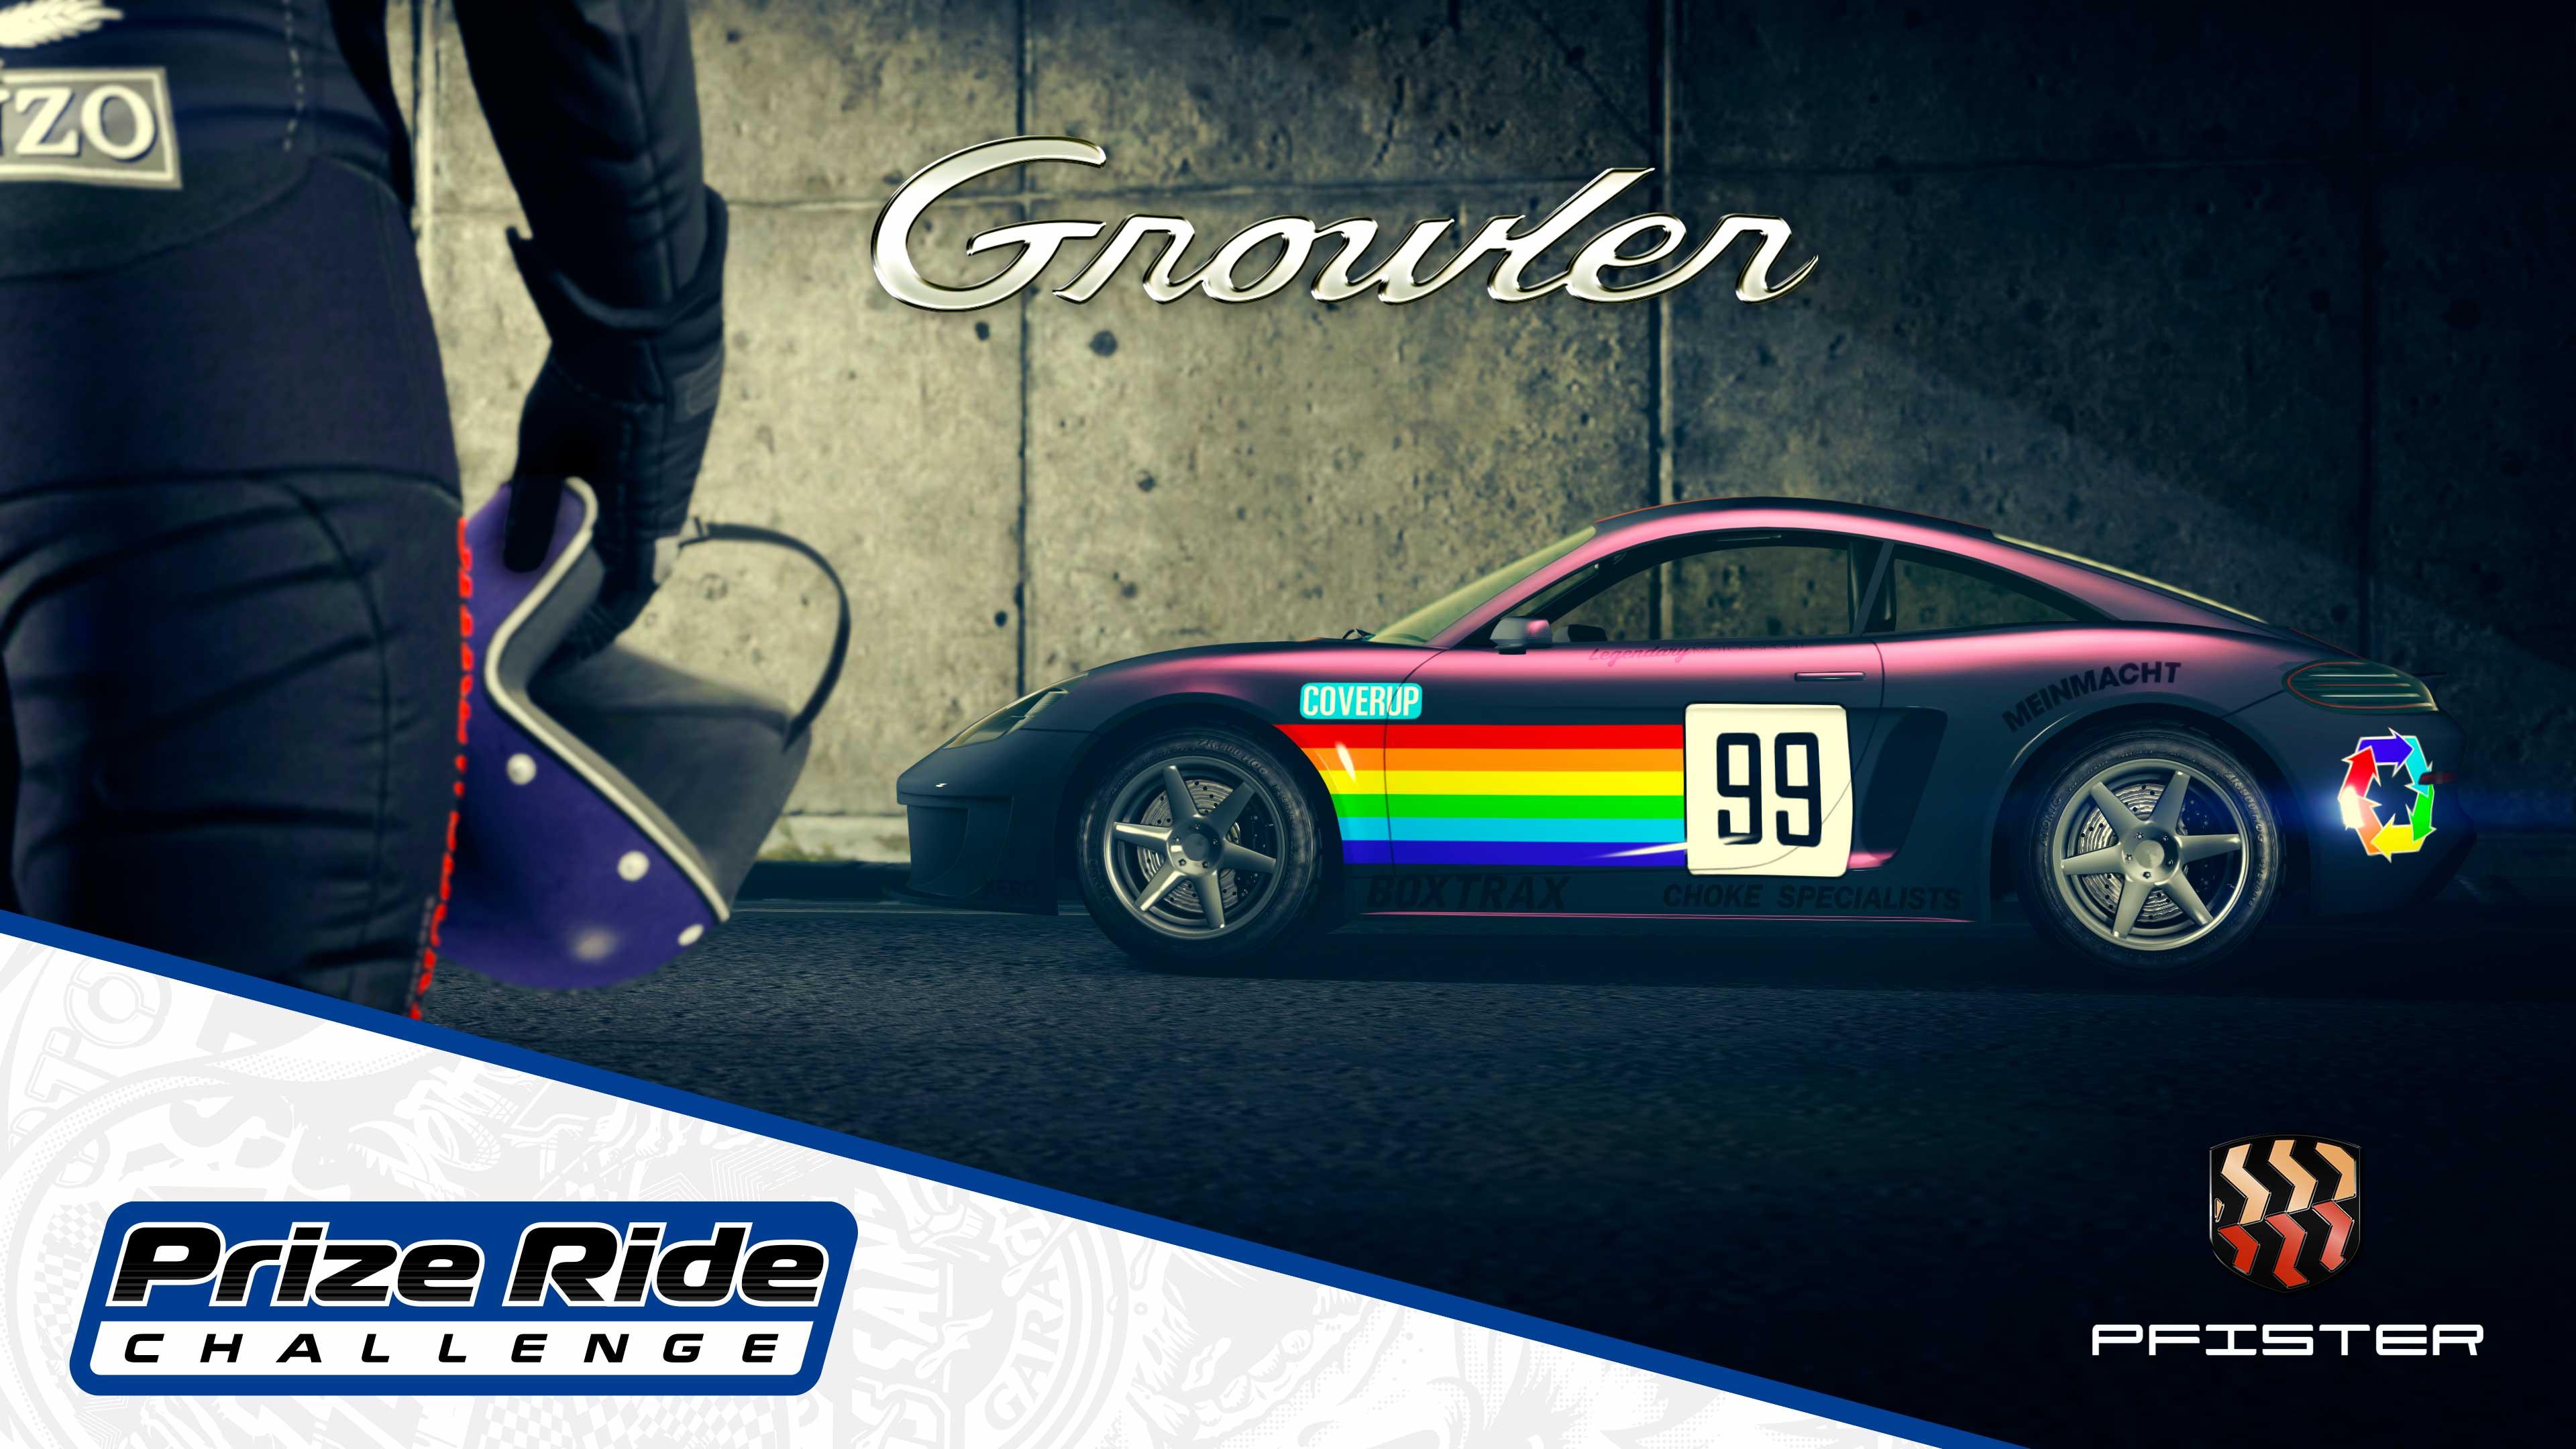 GTA Online Los Santos Tuners Prize Ride: Pfister Growler